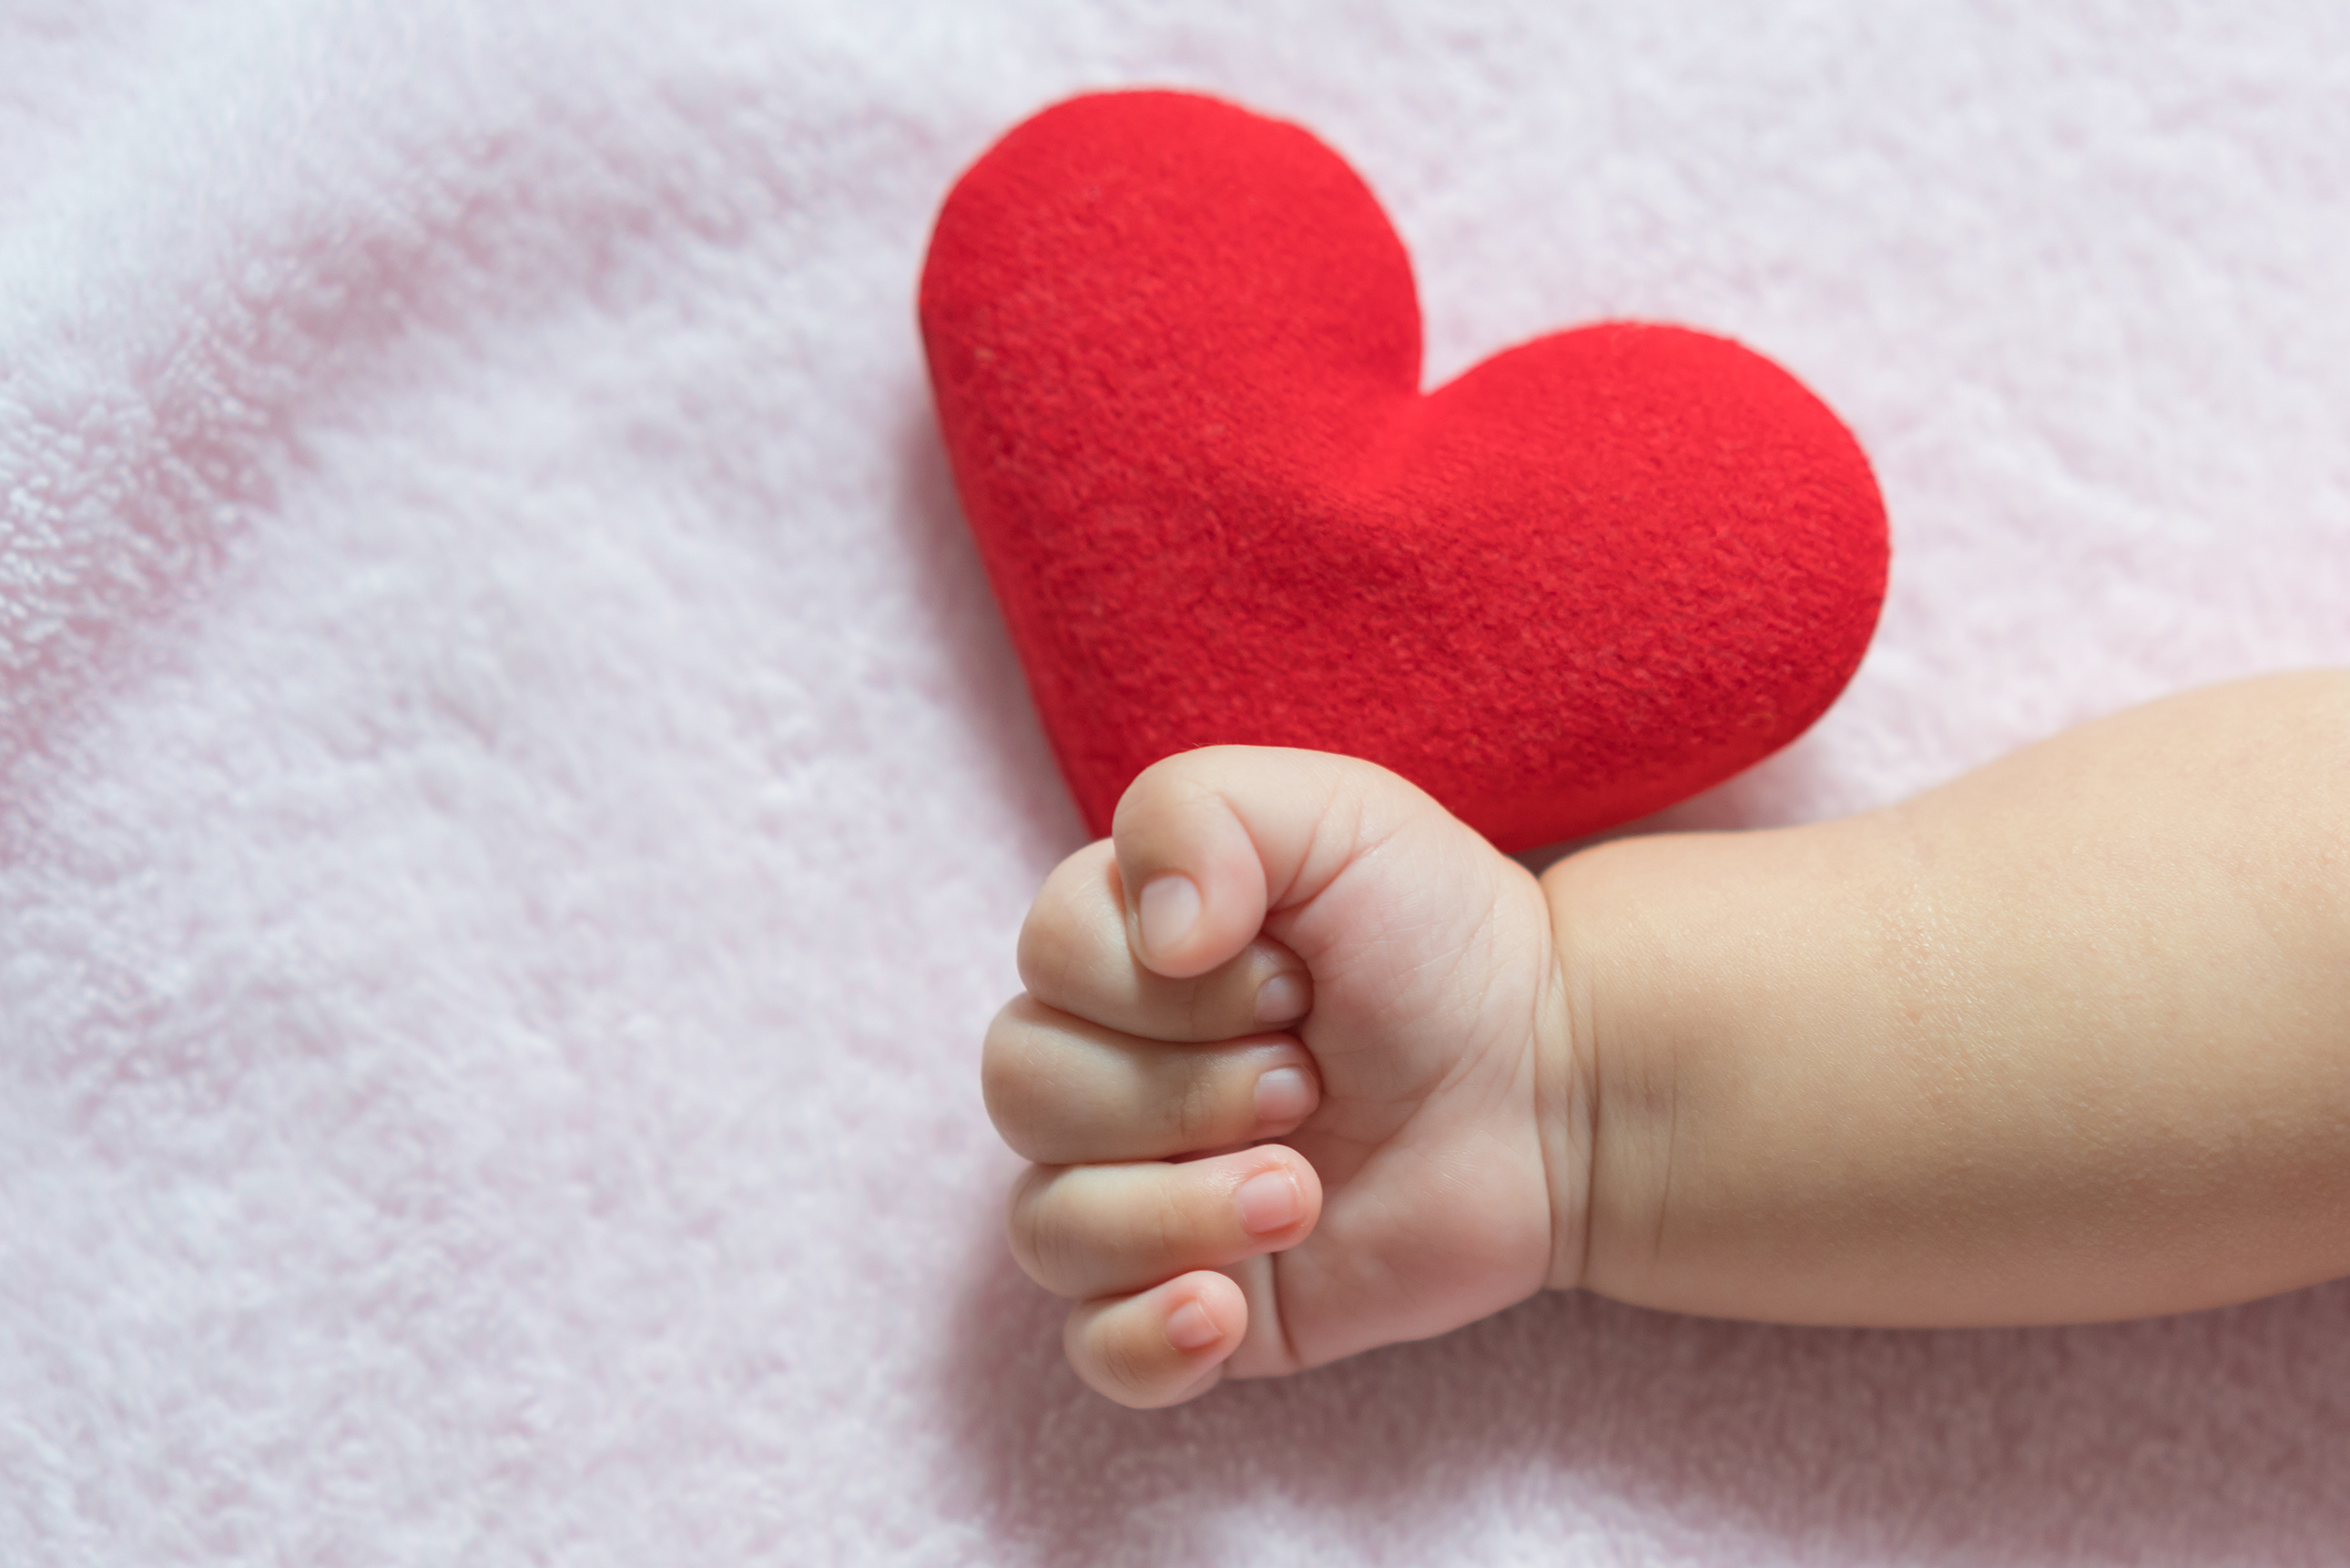 Pediatric Cardiology Photo